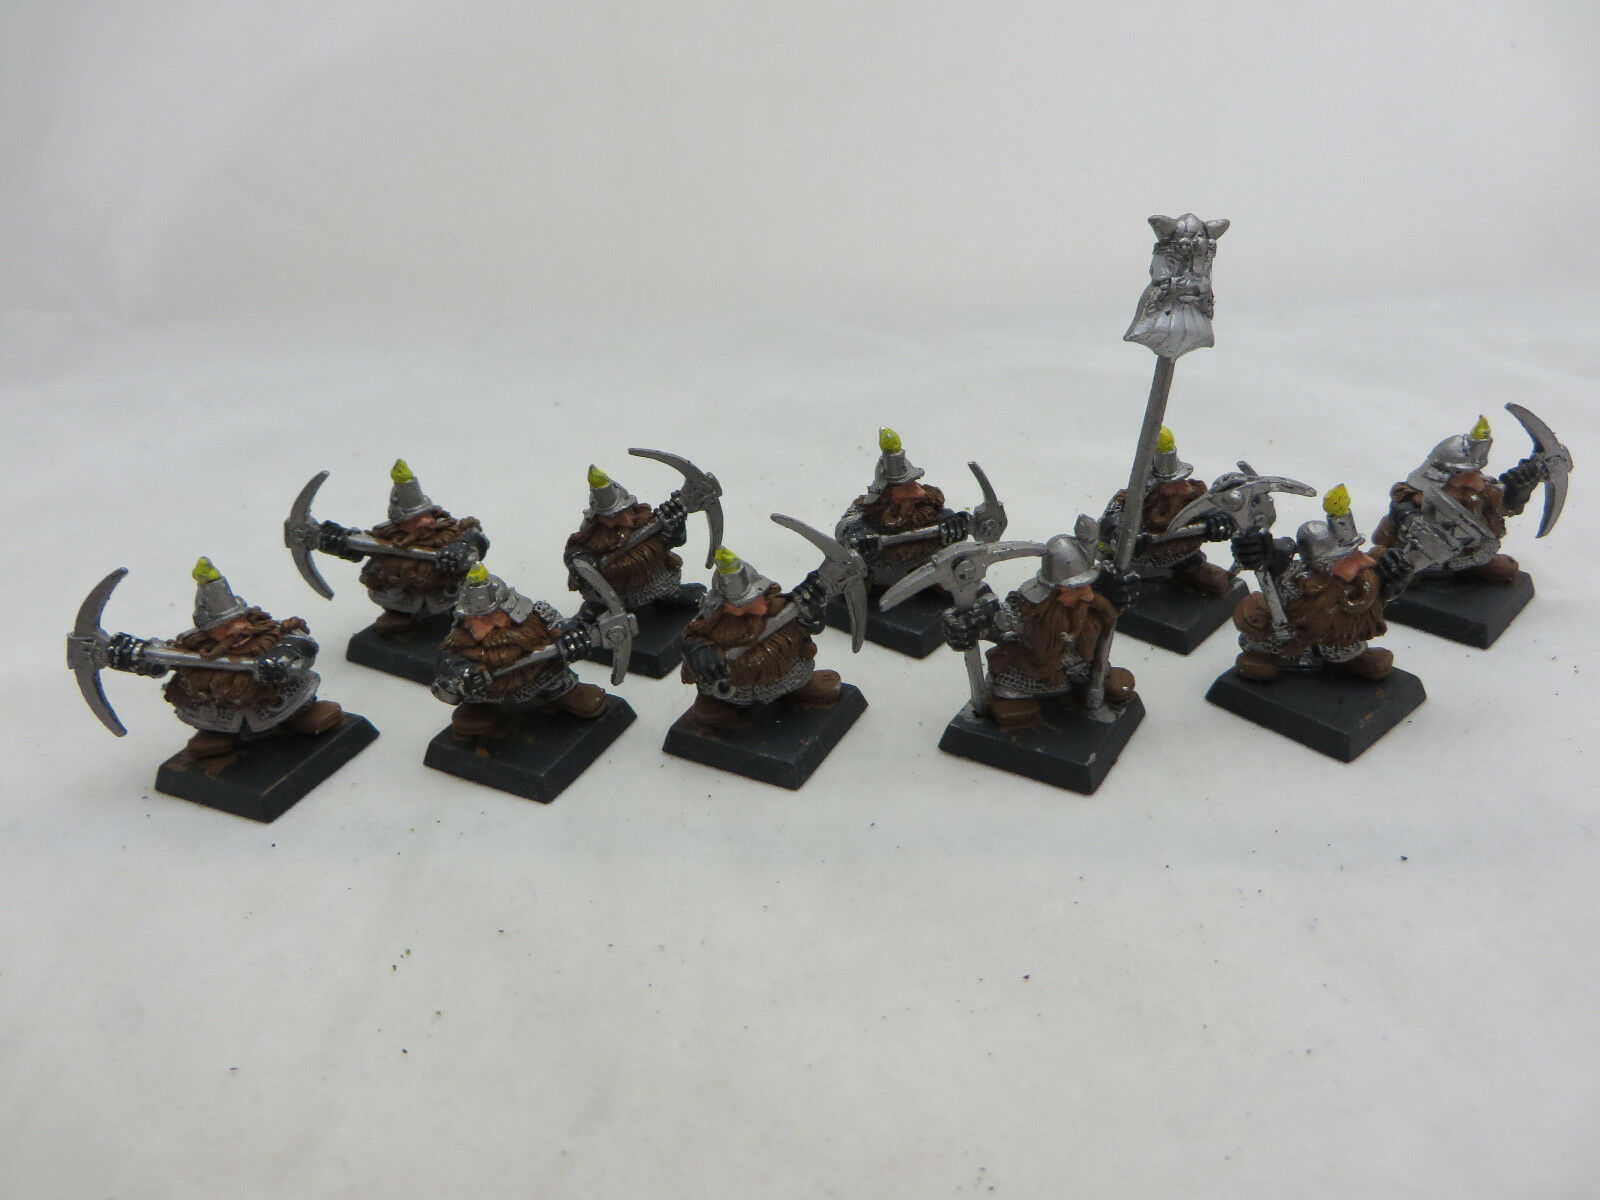 Warhammer Dwarf Miners army lot metal oop AOS dispossessed